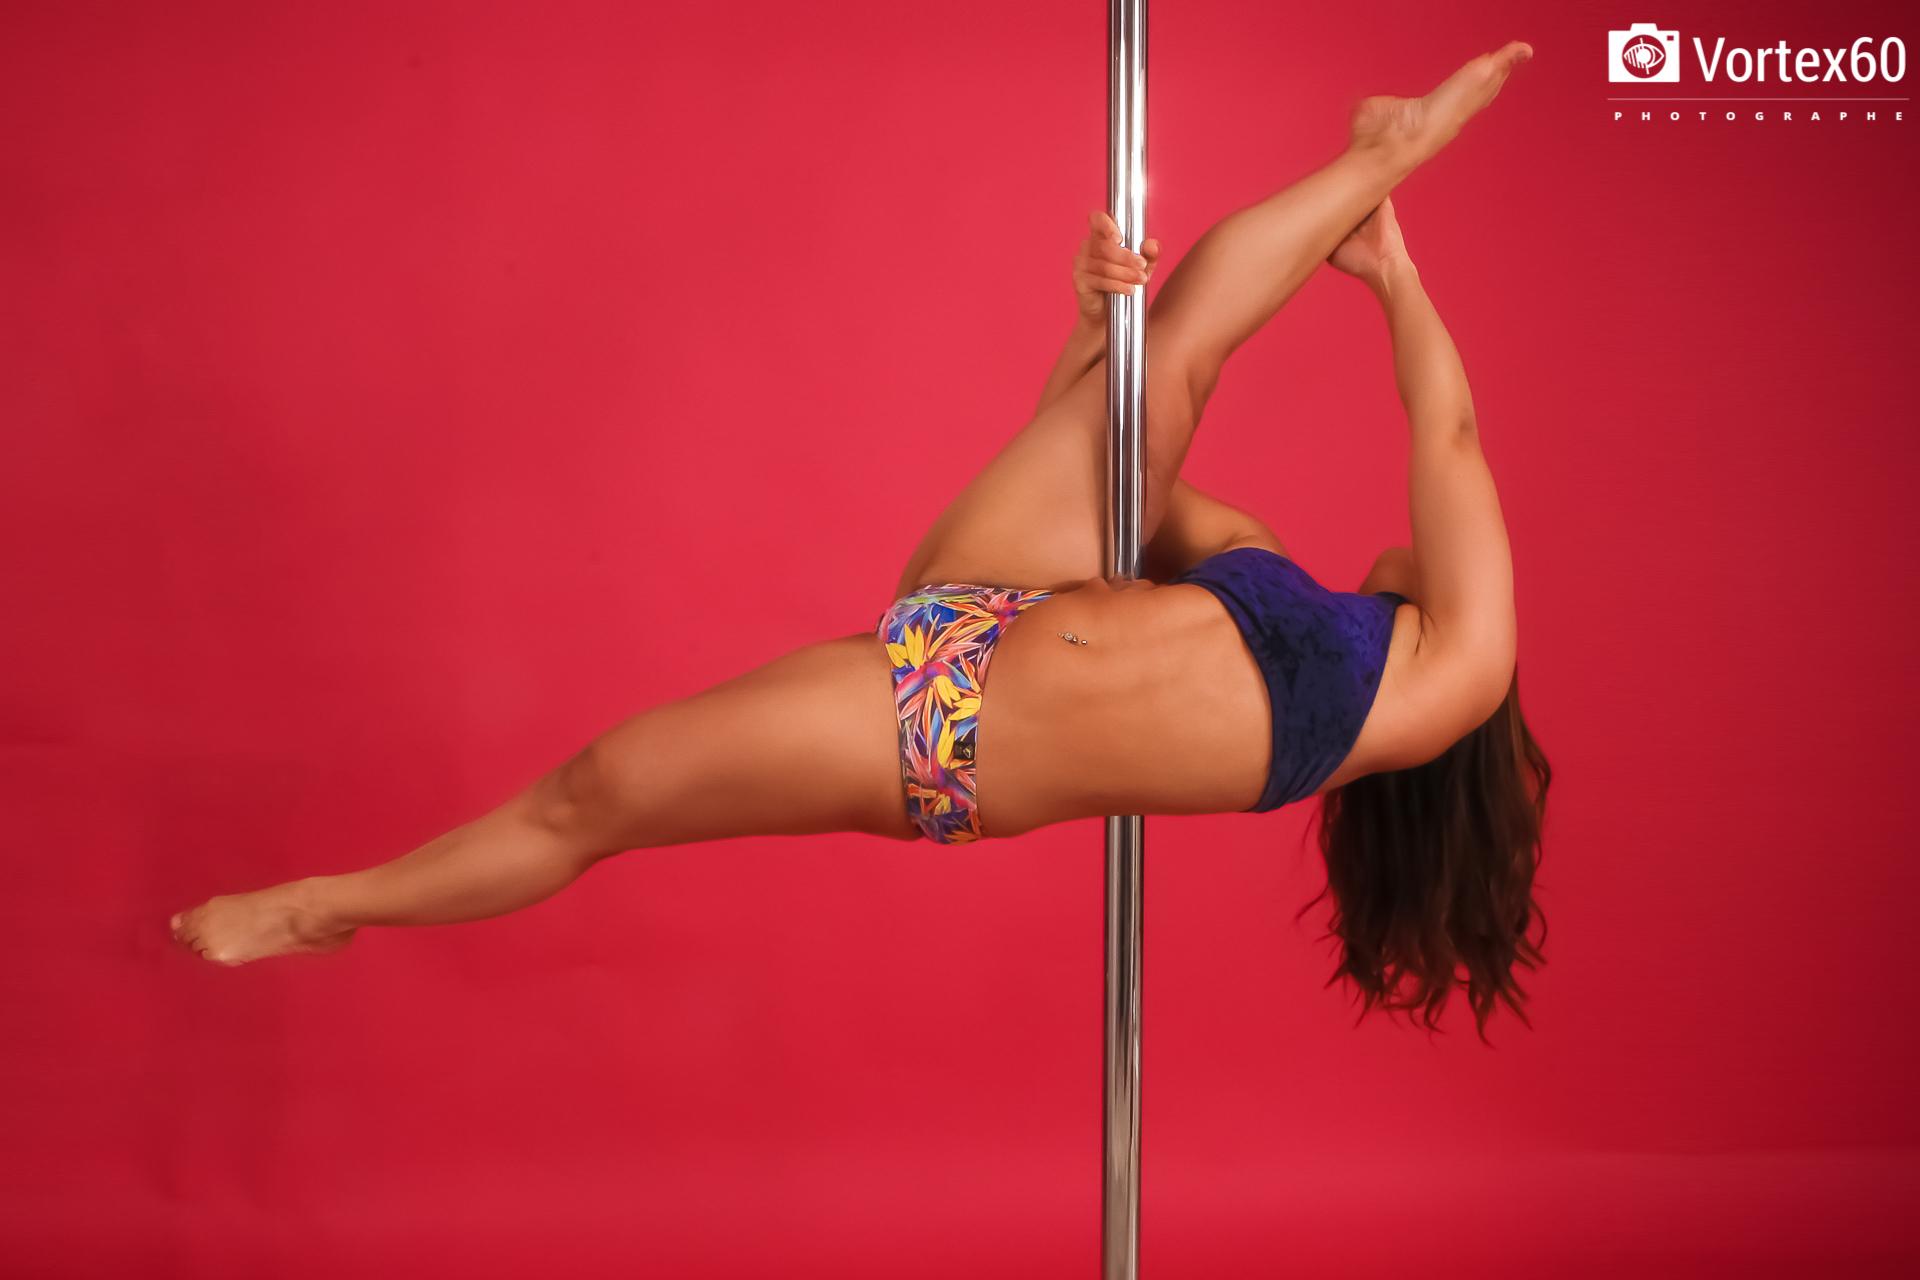 Carole Thib - Pole Dance by Vortex60 Photographe